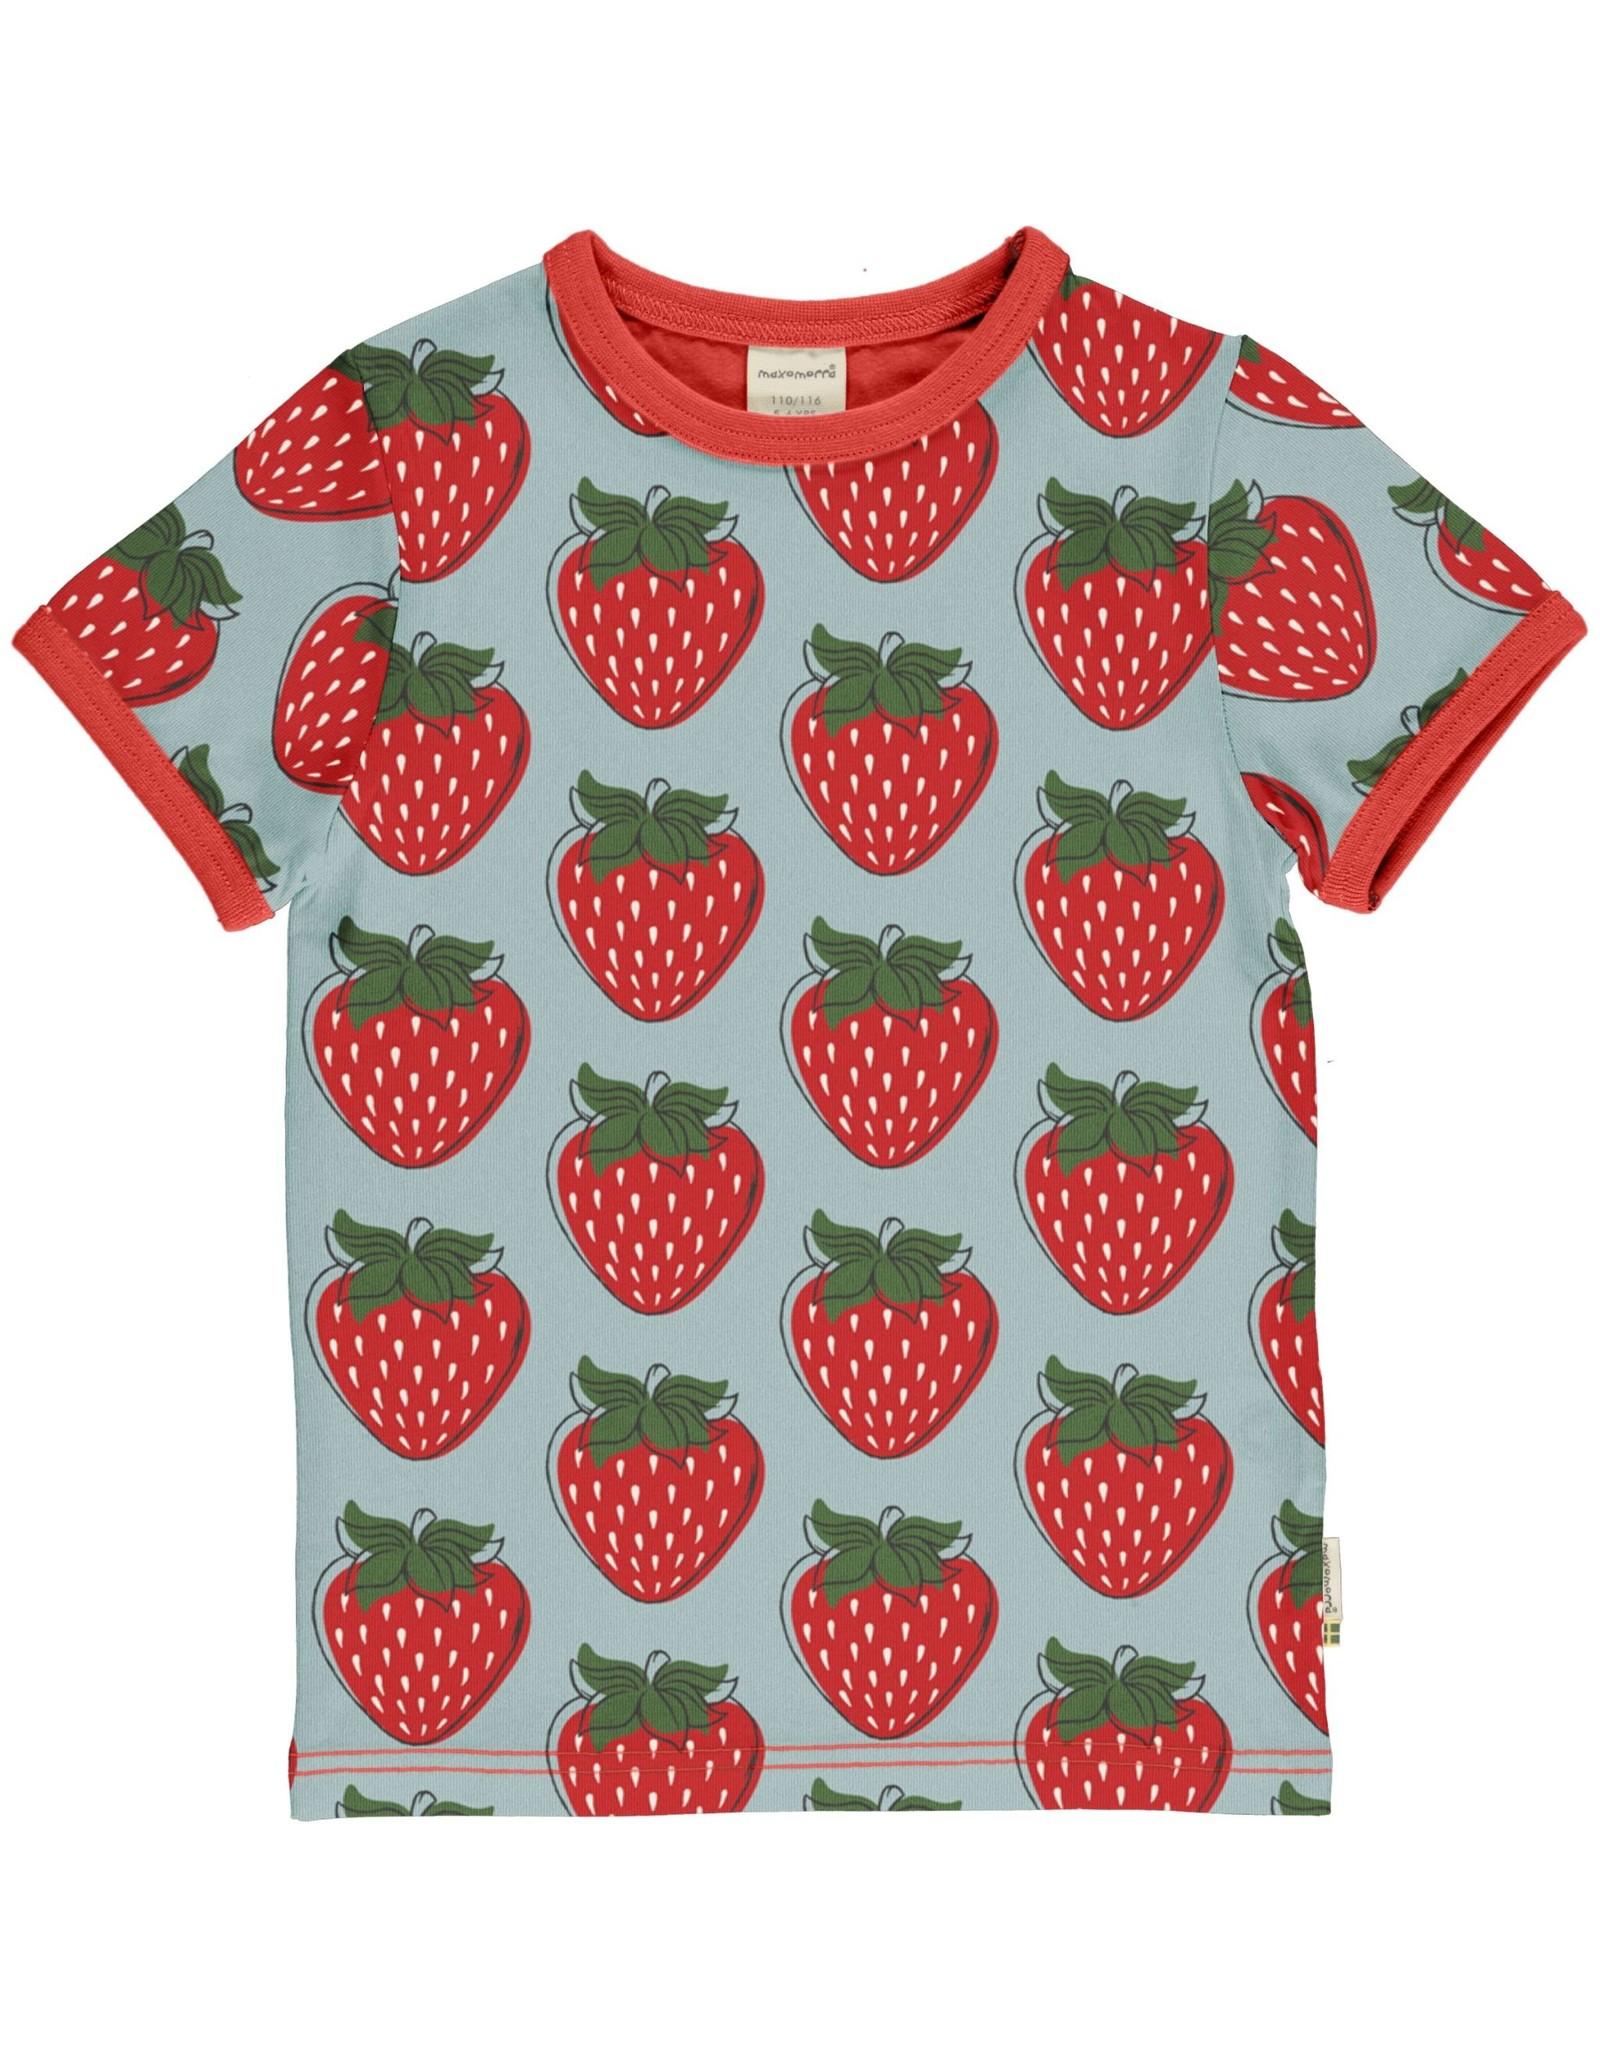 Maxomorra Maxomorra T-shirt met aardbeien print